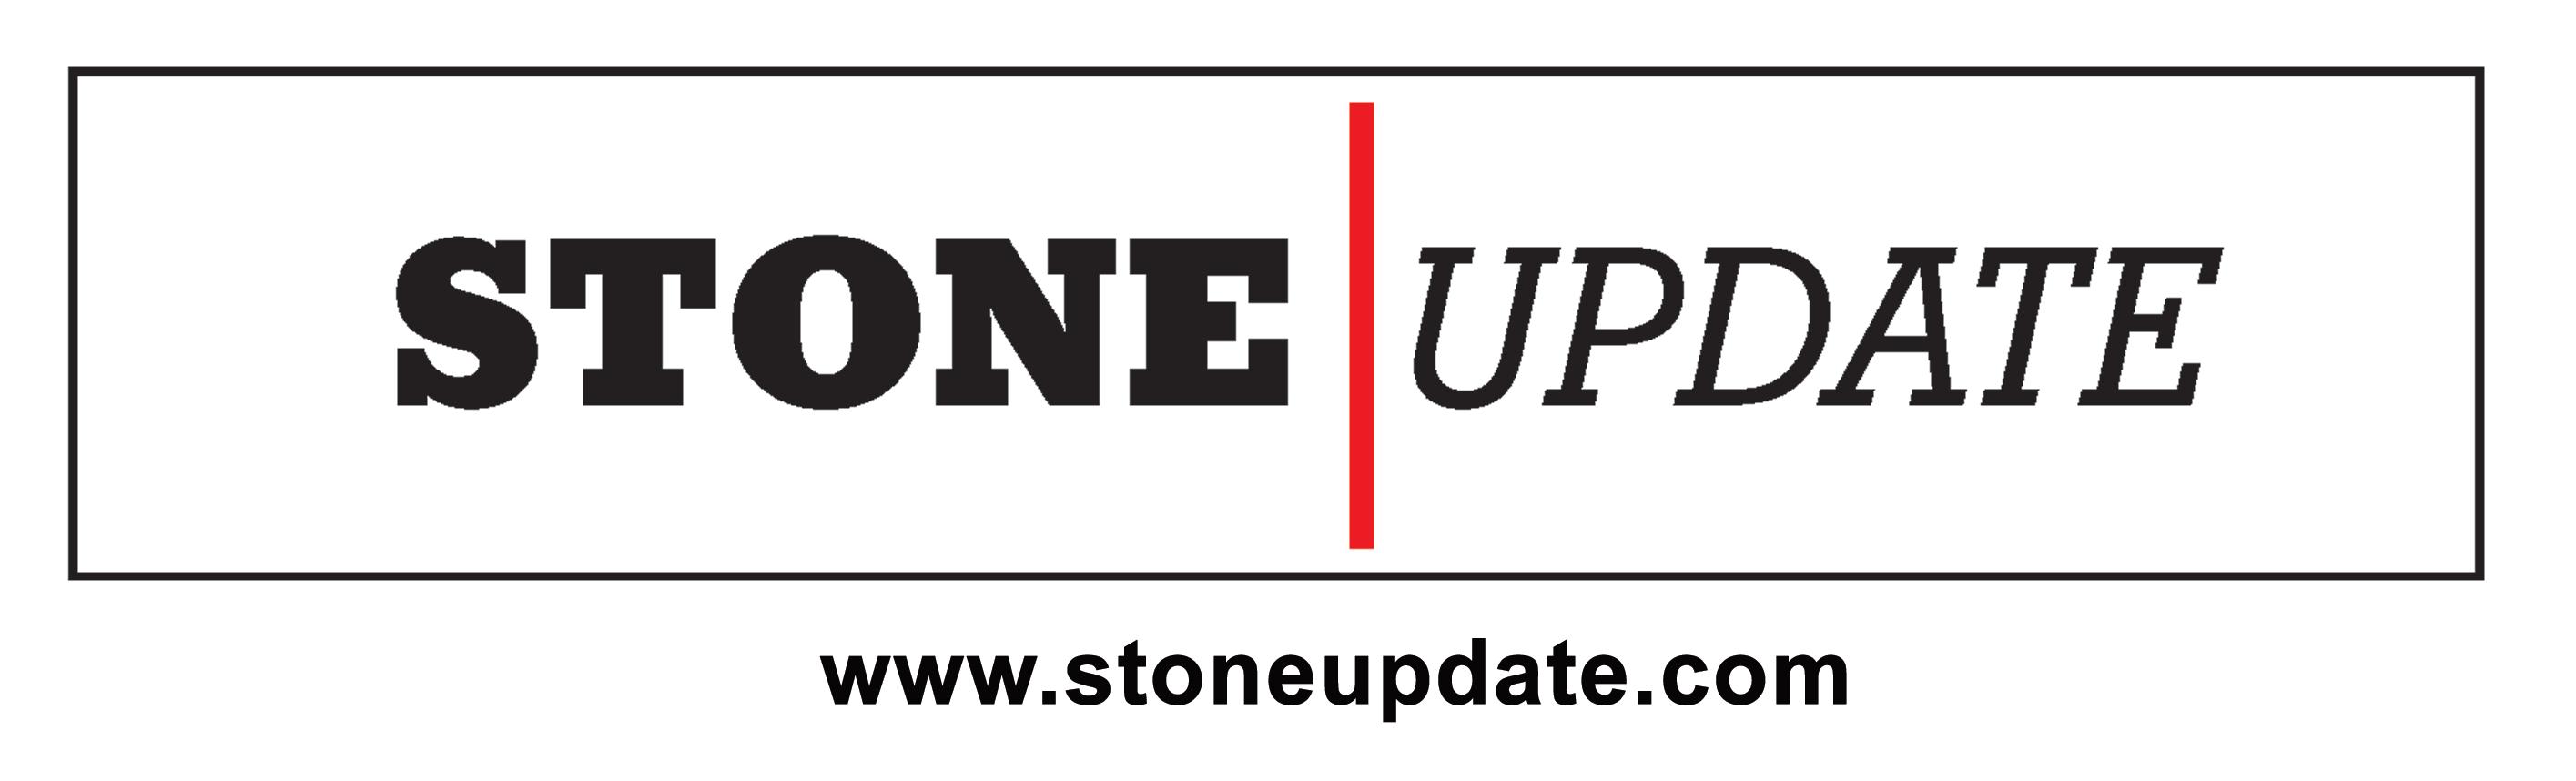 Stone Update